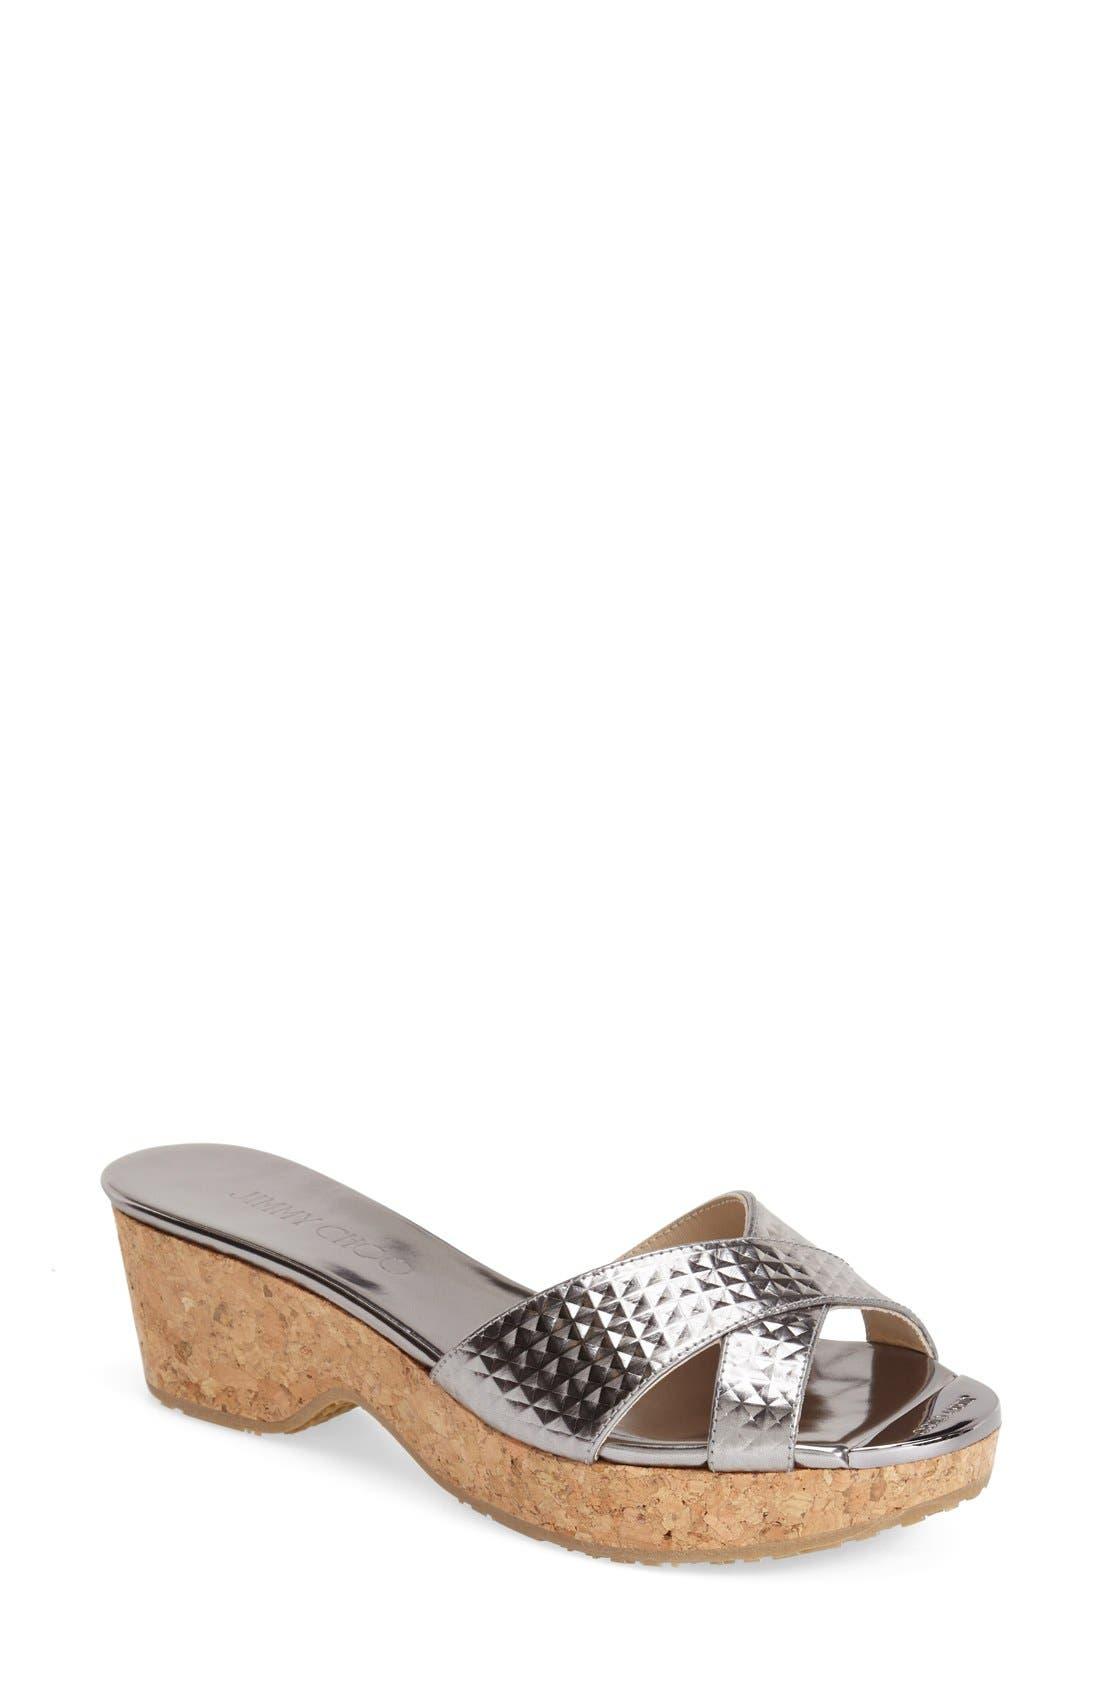 'Panna' Cork Wedge Slide Sandal, Main, color, 040